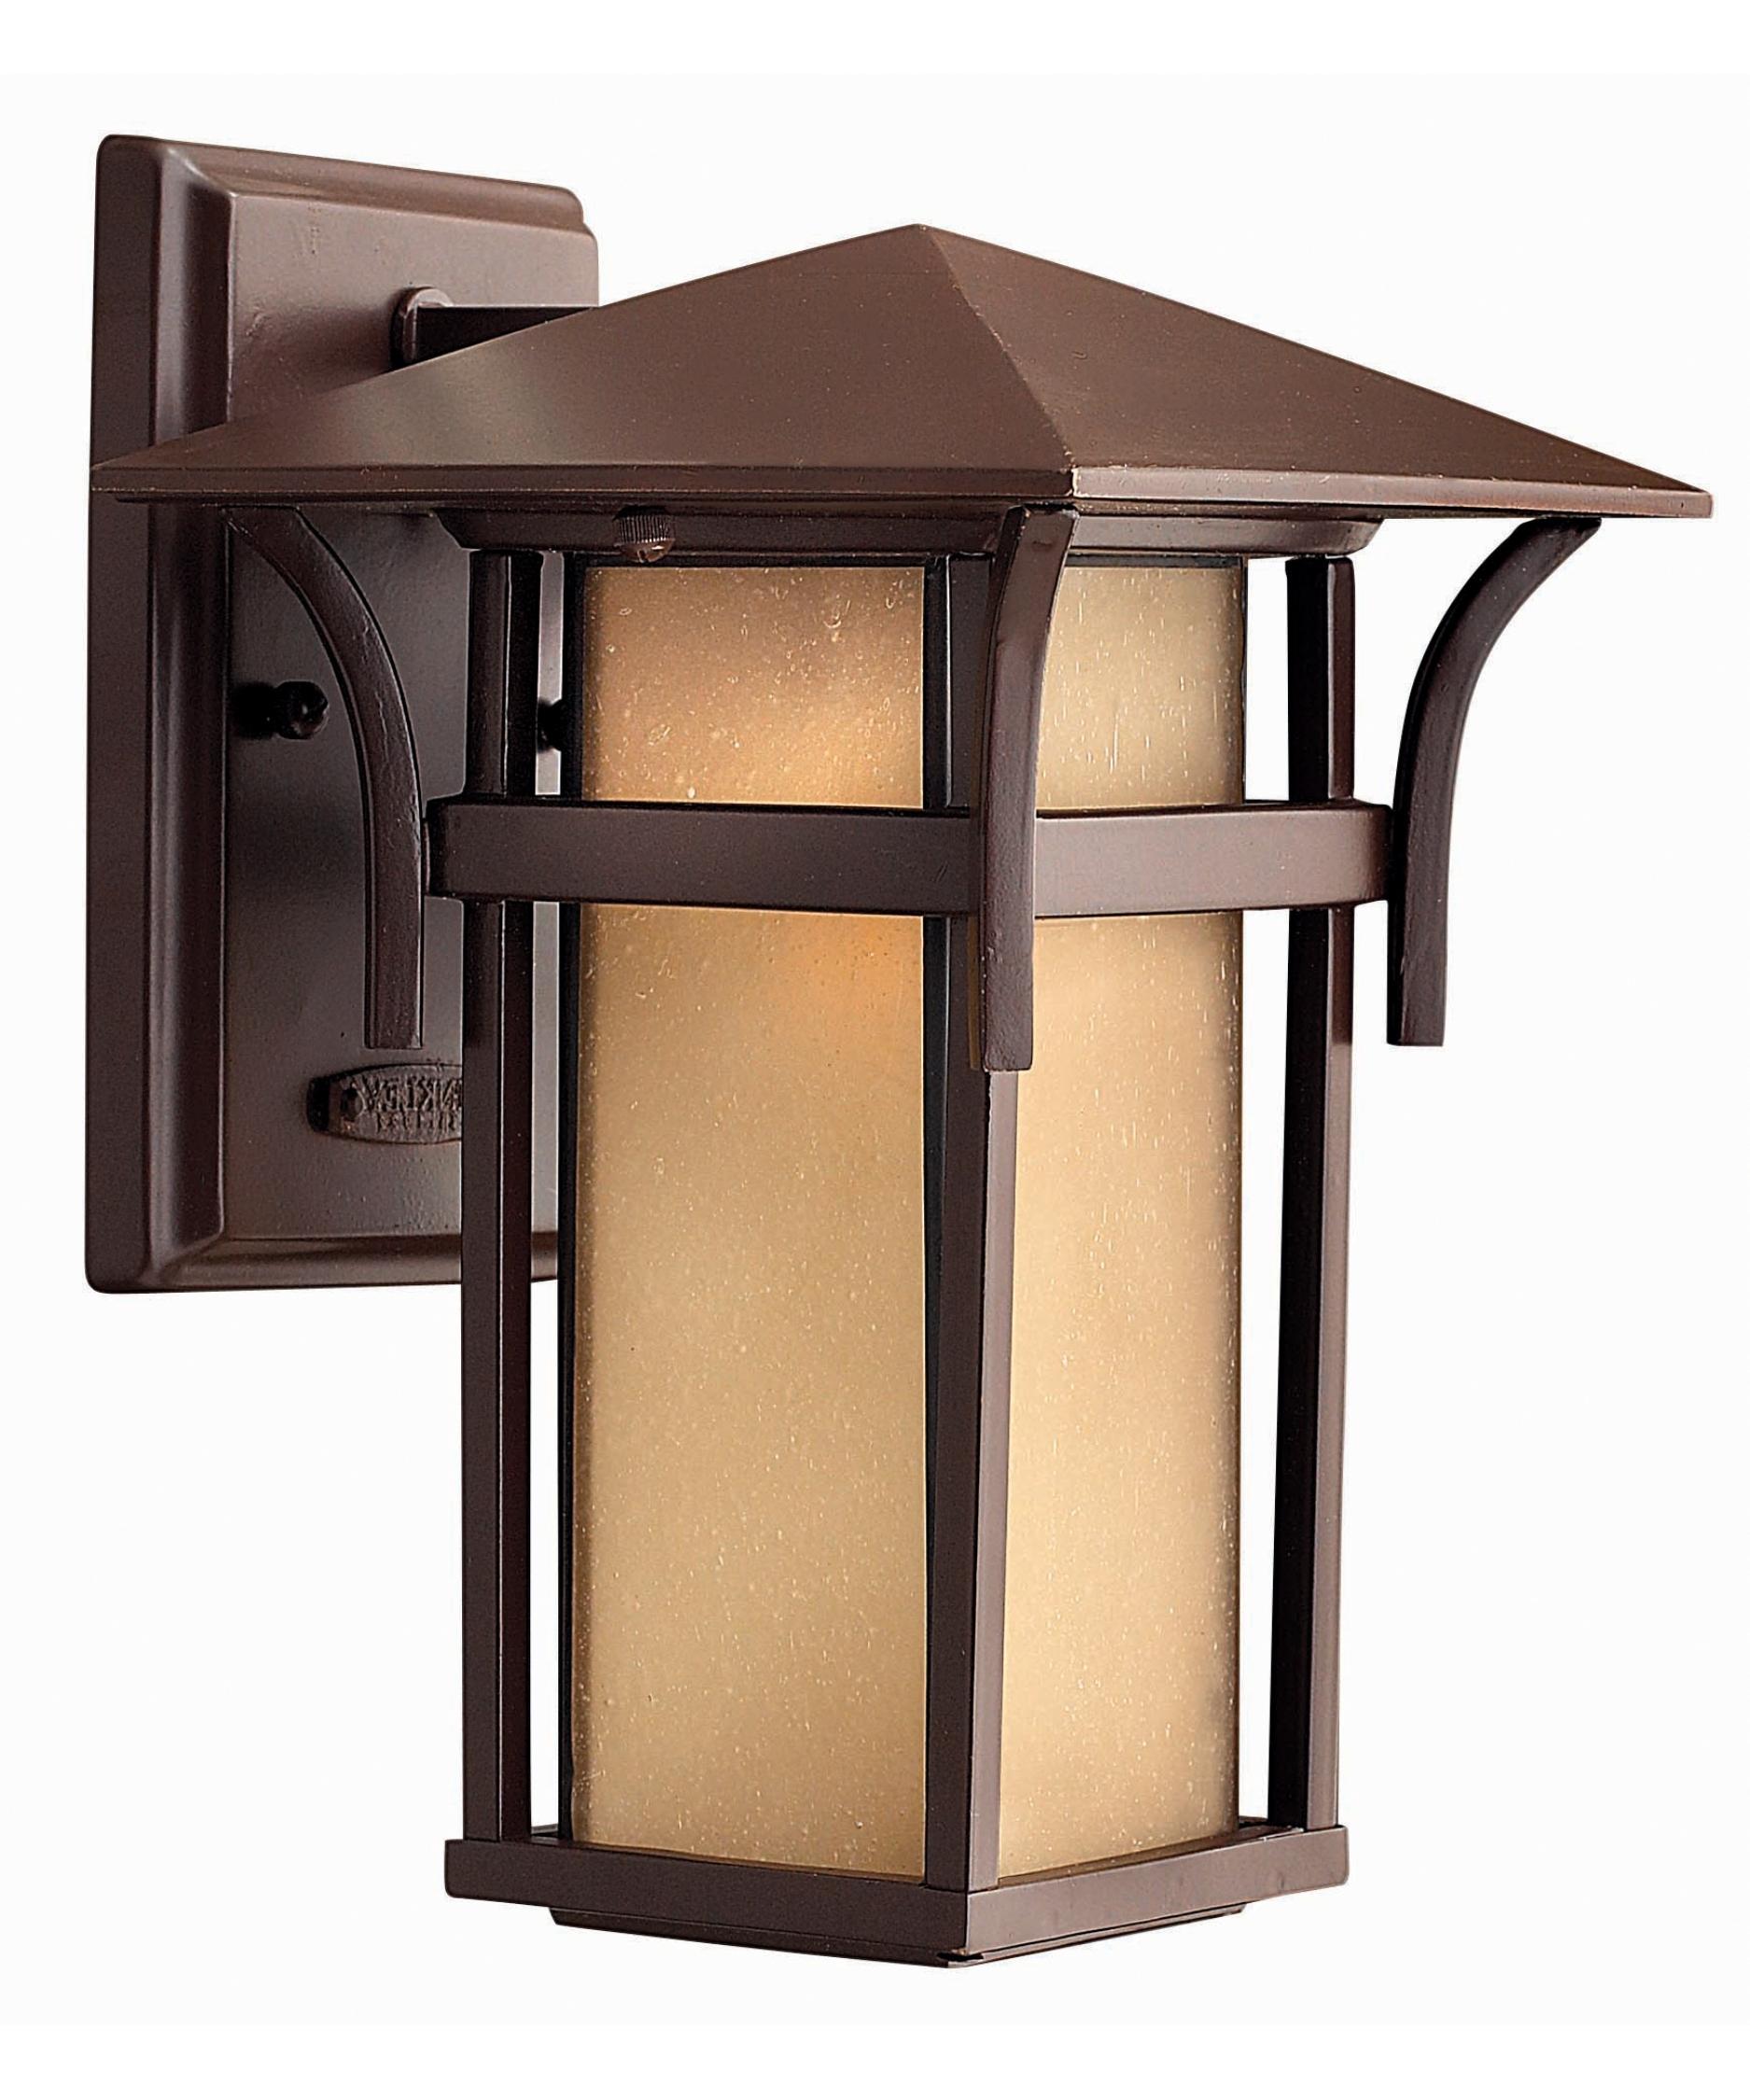 Outdoor Wall Lighting At Walmart Inside 2018 Outdoor Porch Light Fixtures Lighting Exterior Fixture Simple Design (View 12 of 20)